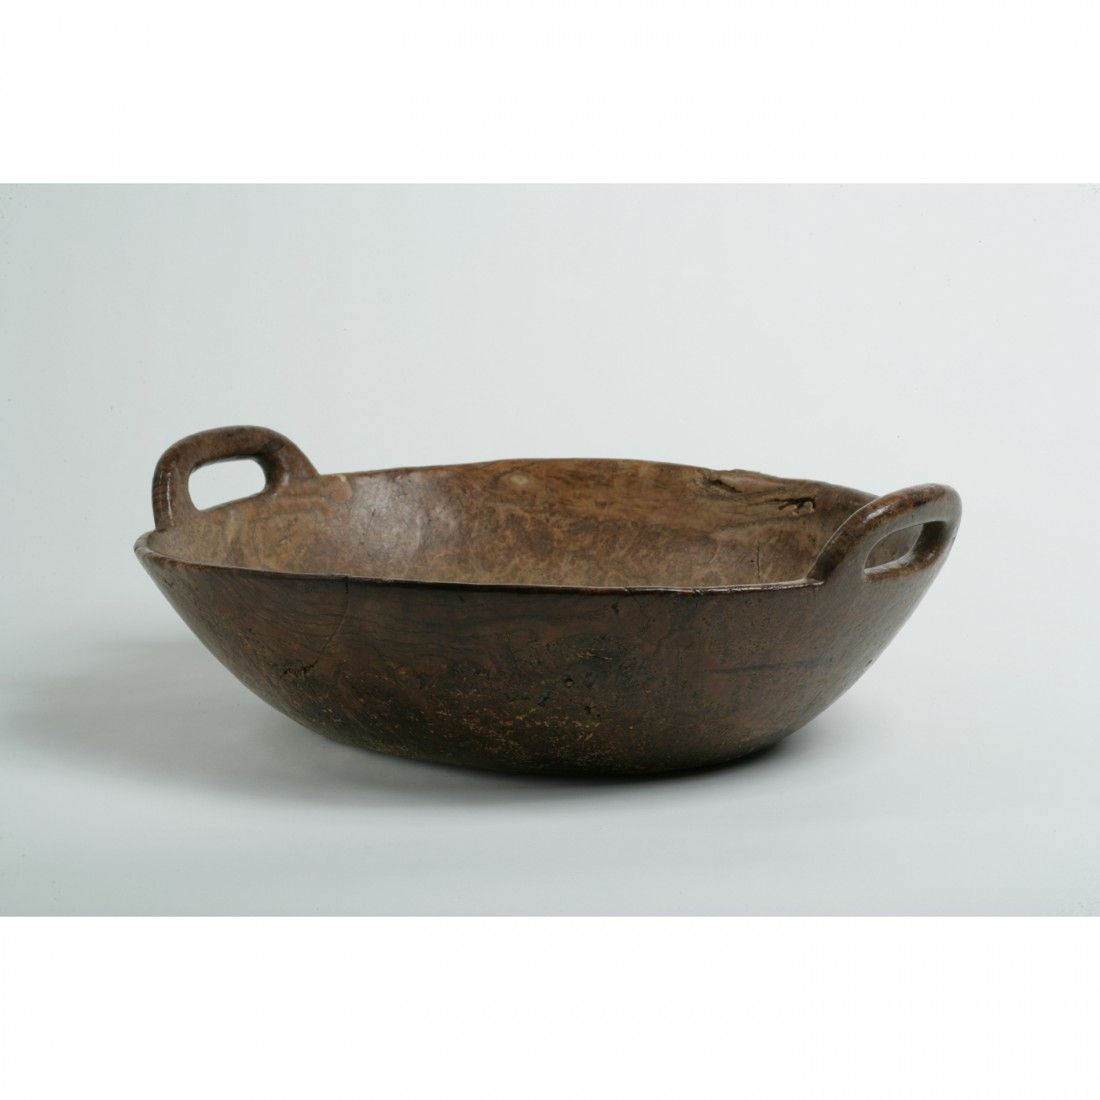 Iroquois Ash Burl Bowl With Open Handles